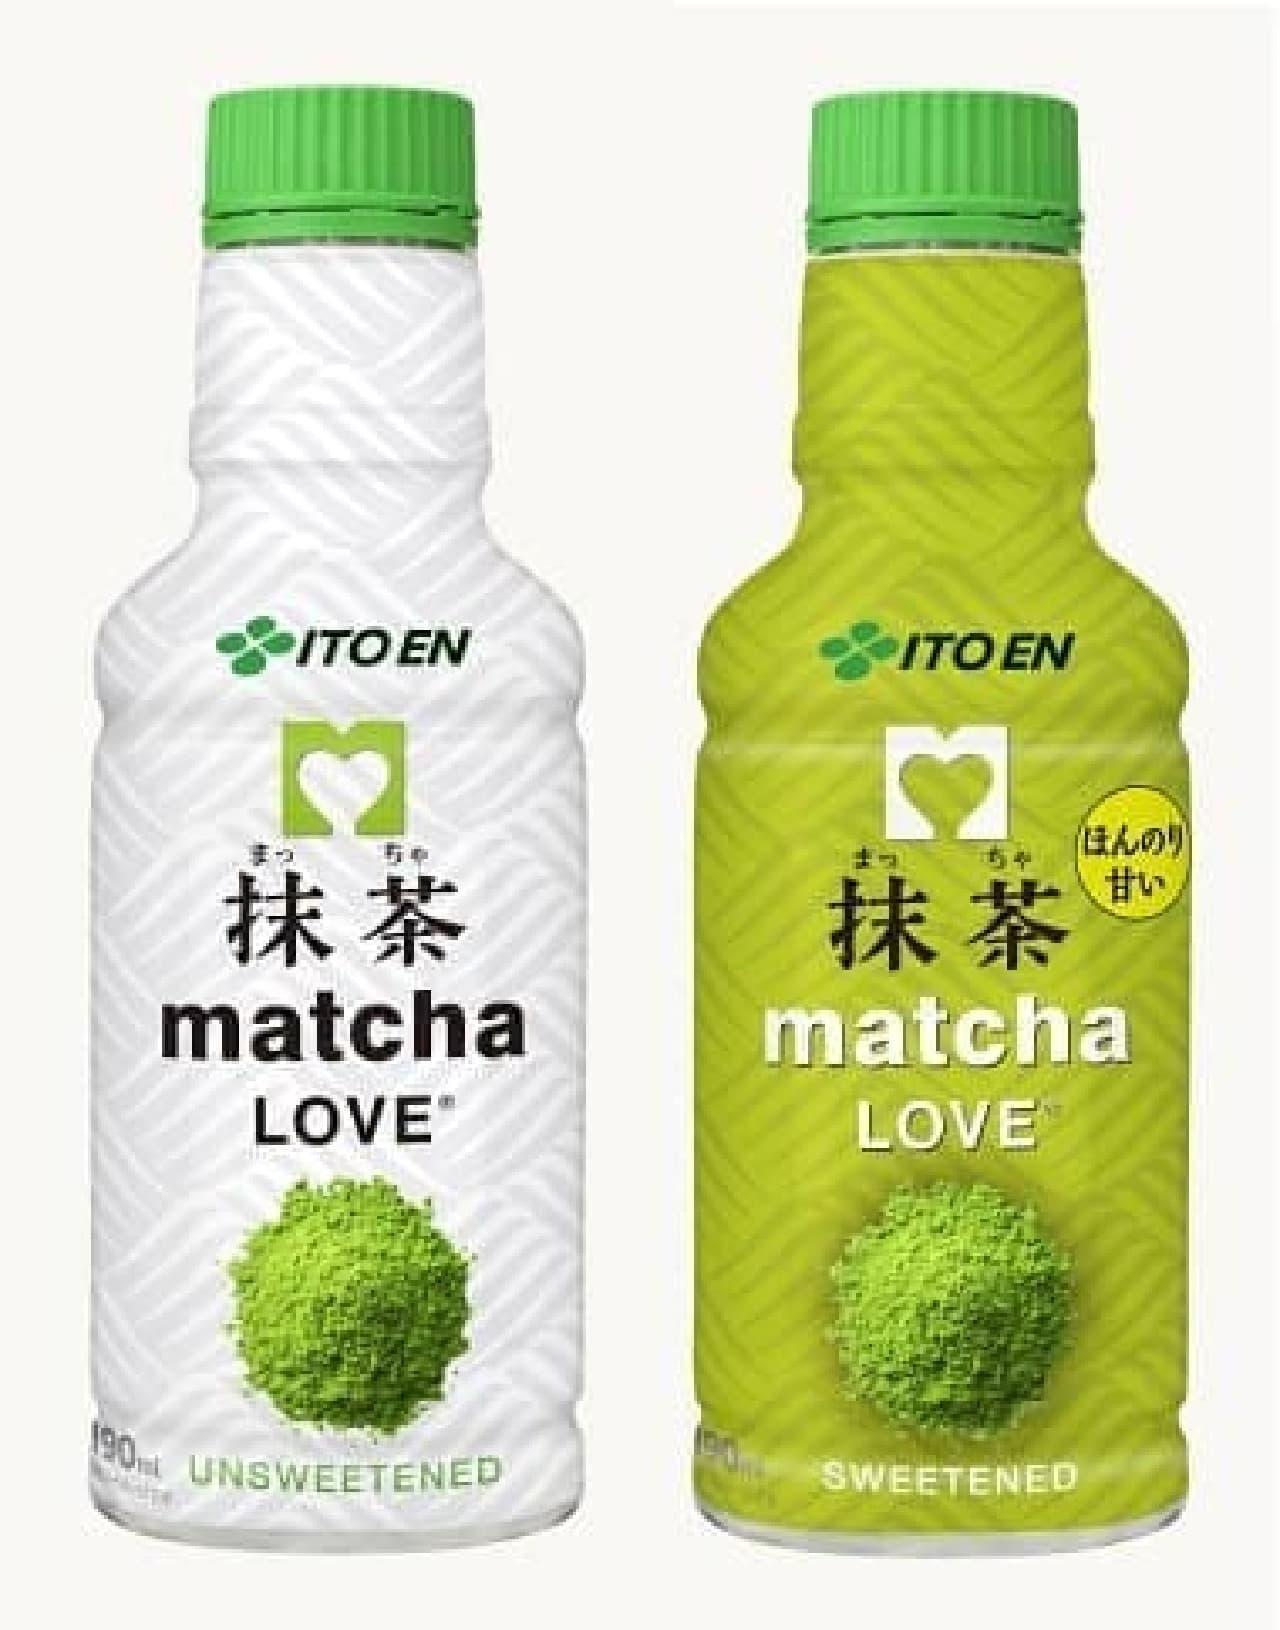 「matcha LOVE」と「matcha LOVE ほんのり甘い」